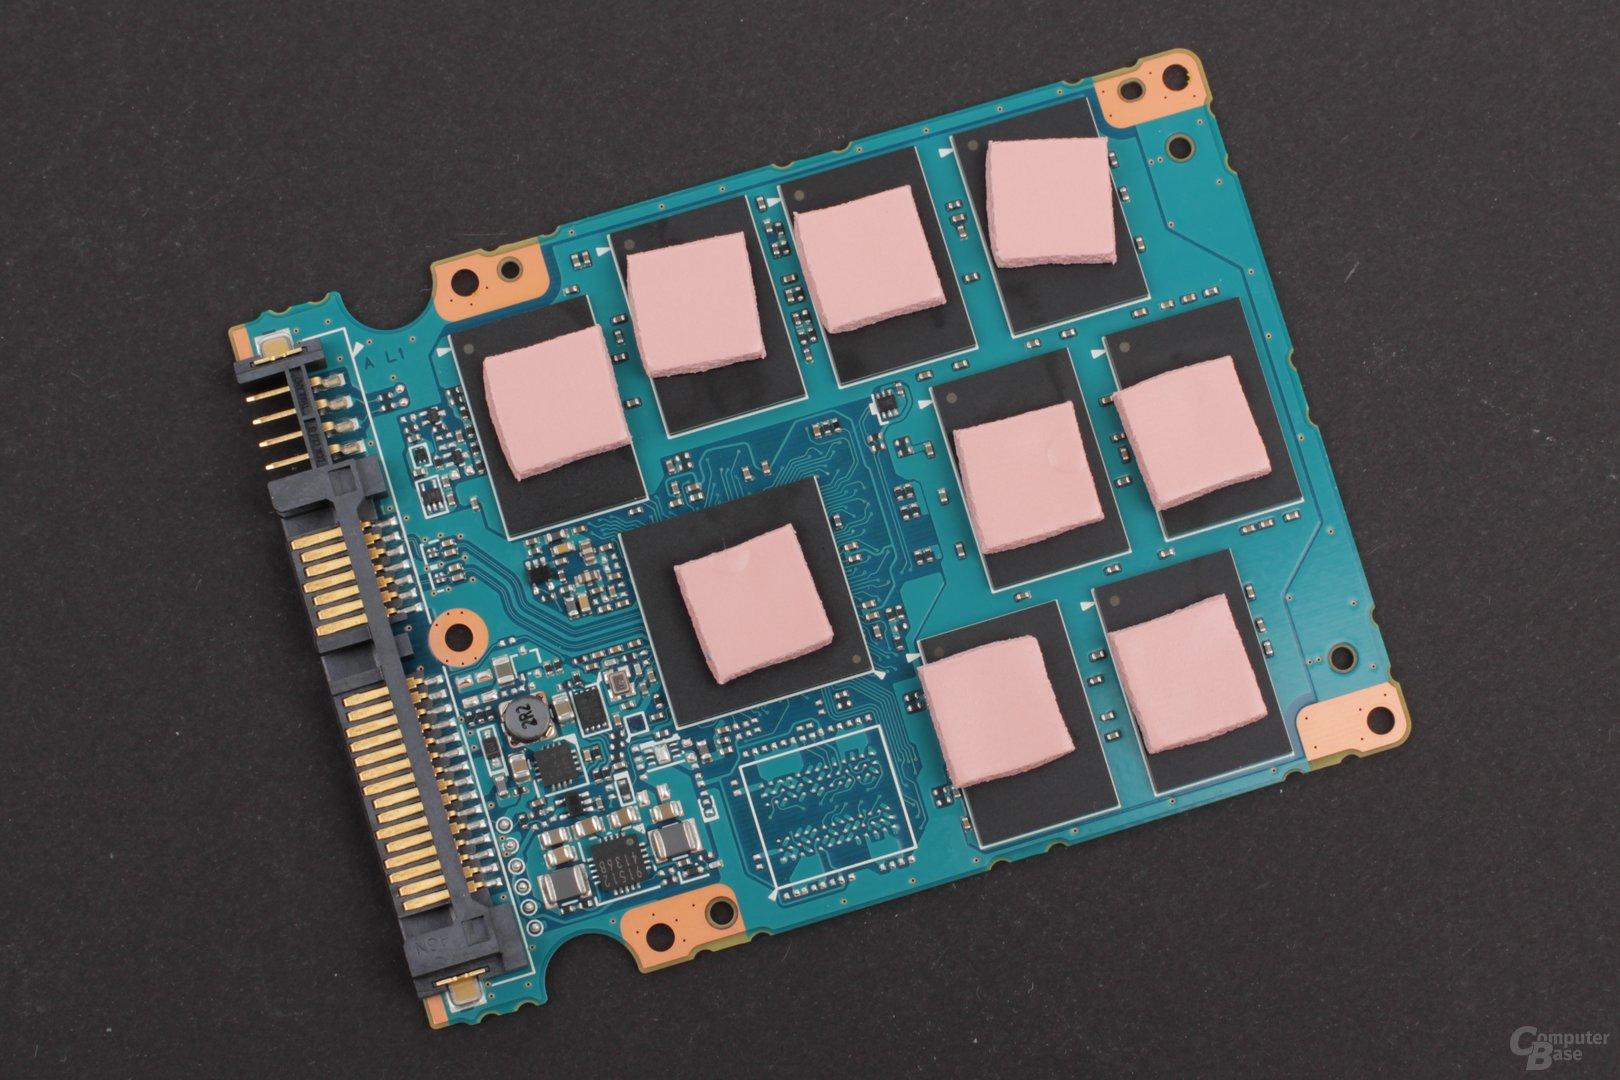 Toshiba HG6 mit 256 GB im Test